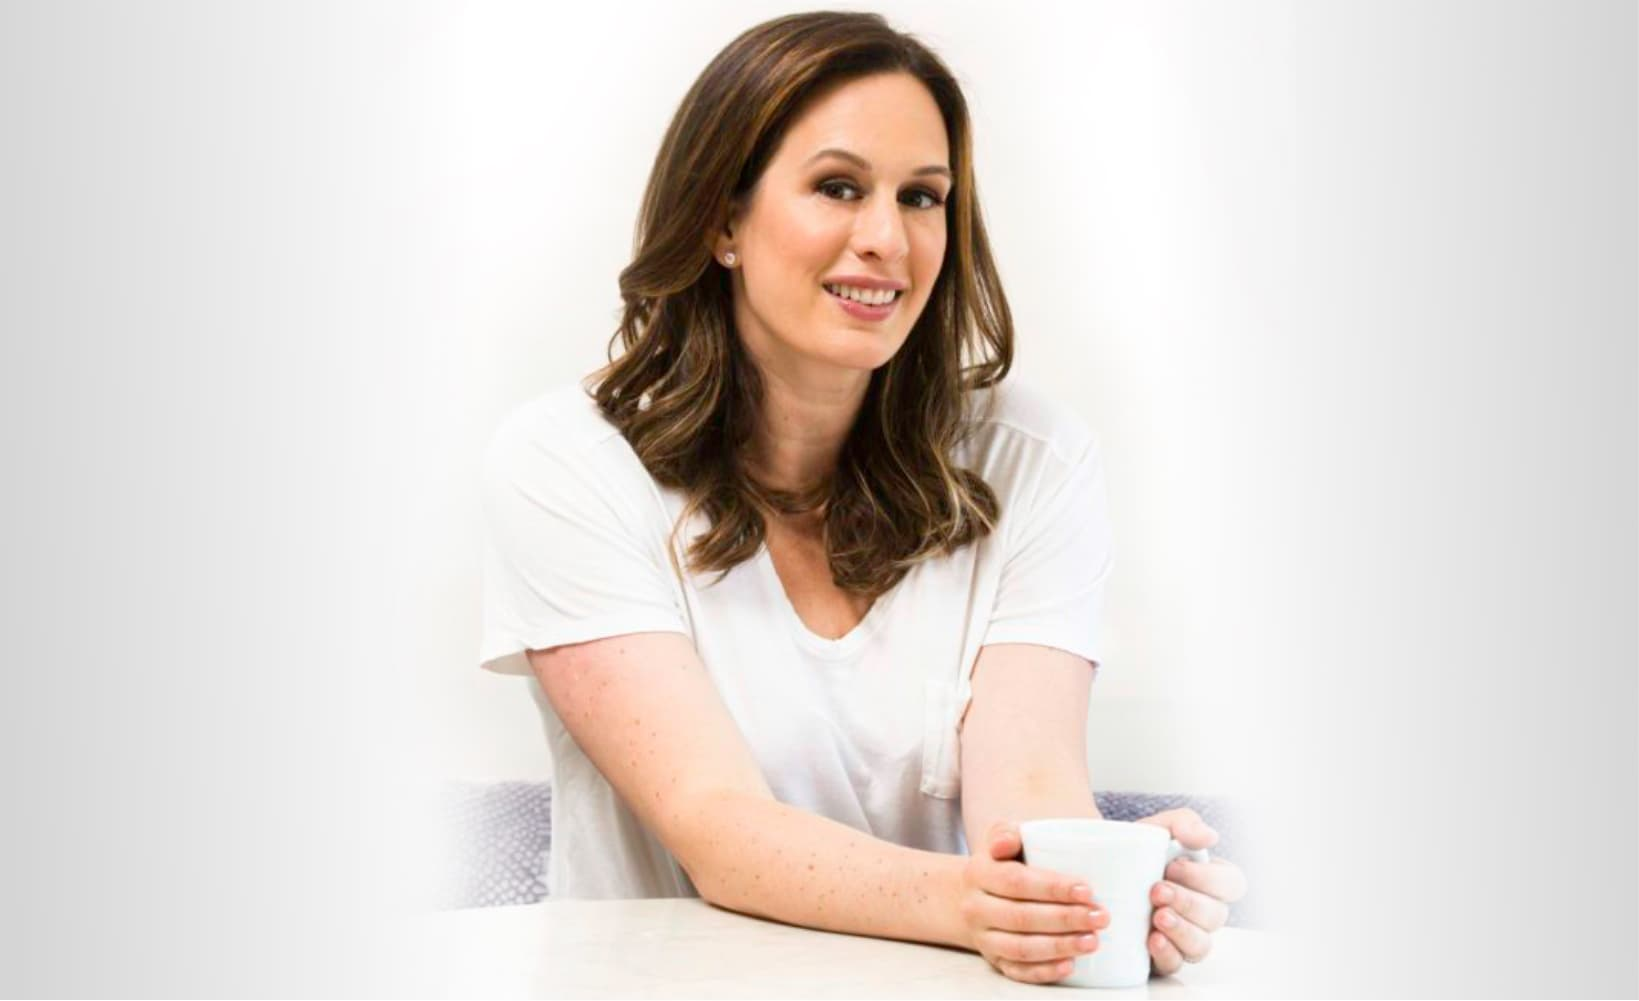 Brooke Alpert - Daily Habit CBD